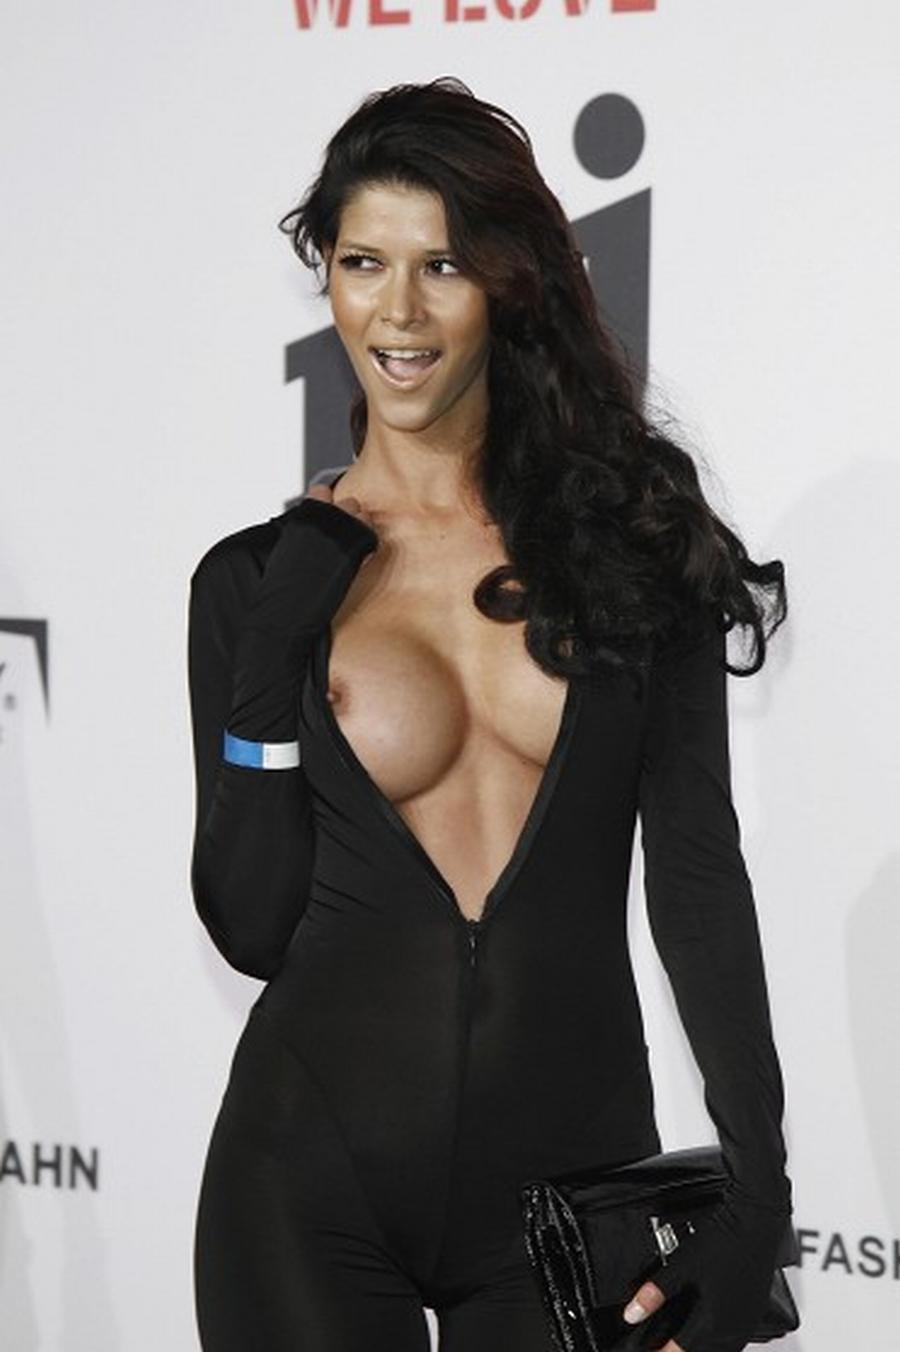 Sideboobs Micaela Schafer nude (43 photo), Tits, Bikini, Twitter, legs 2018